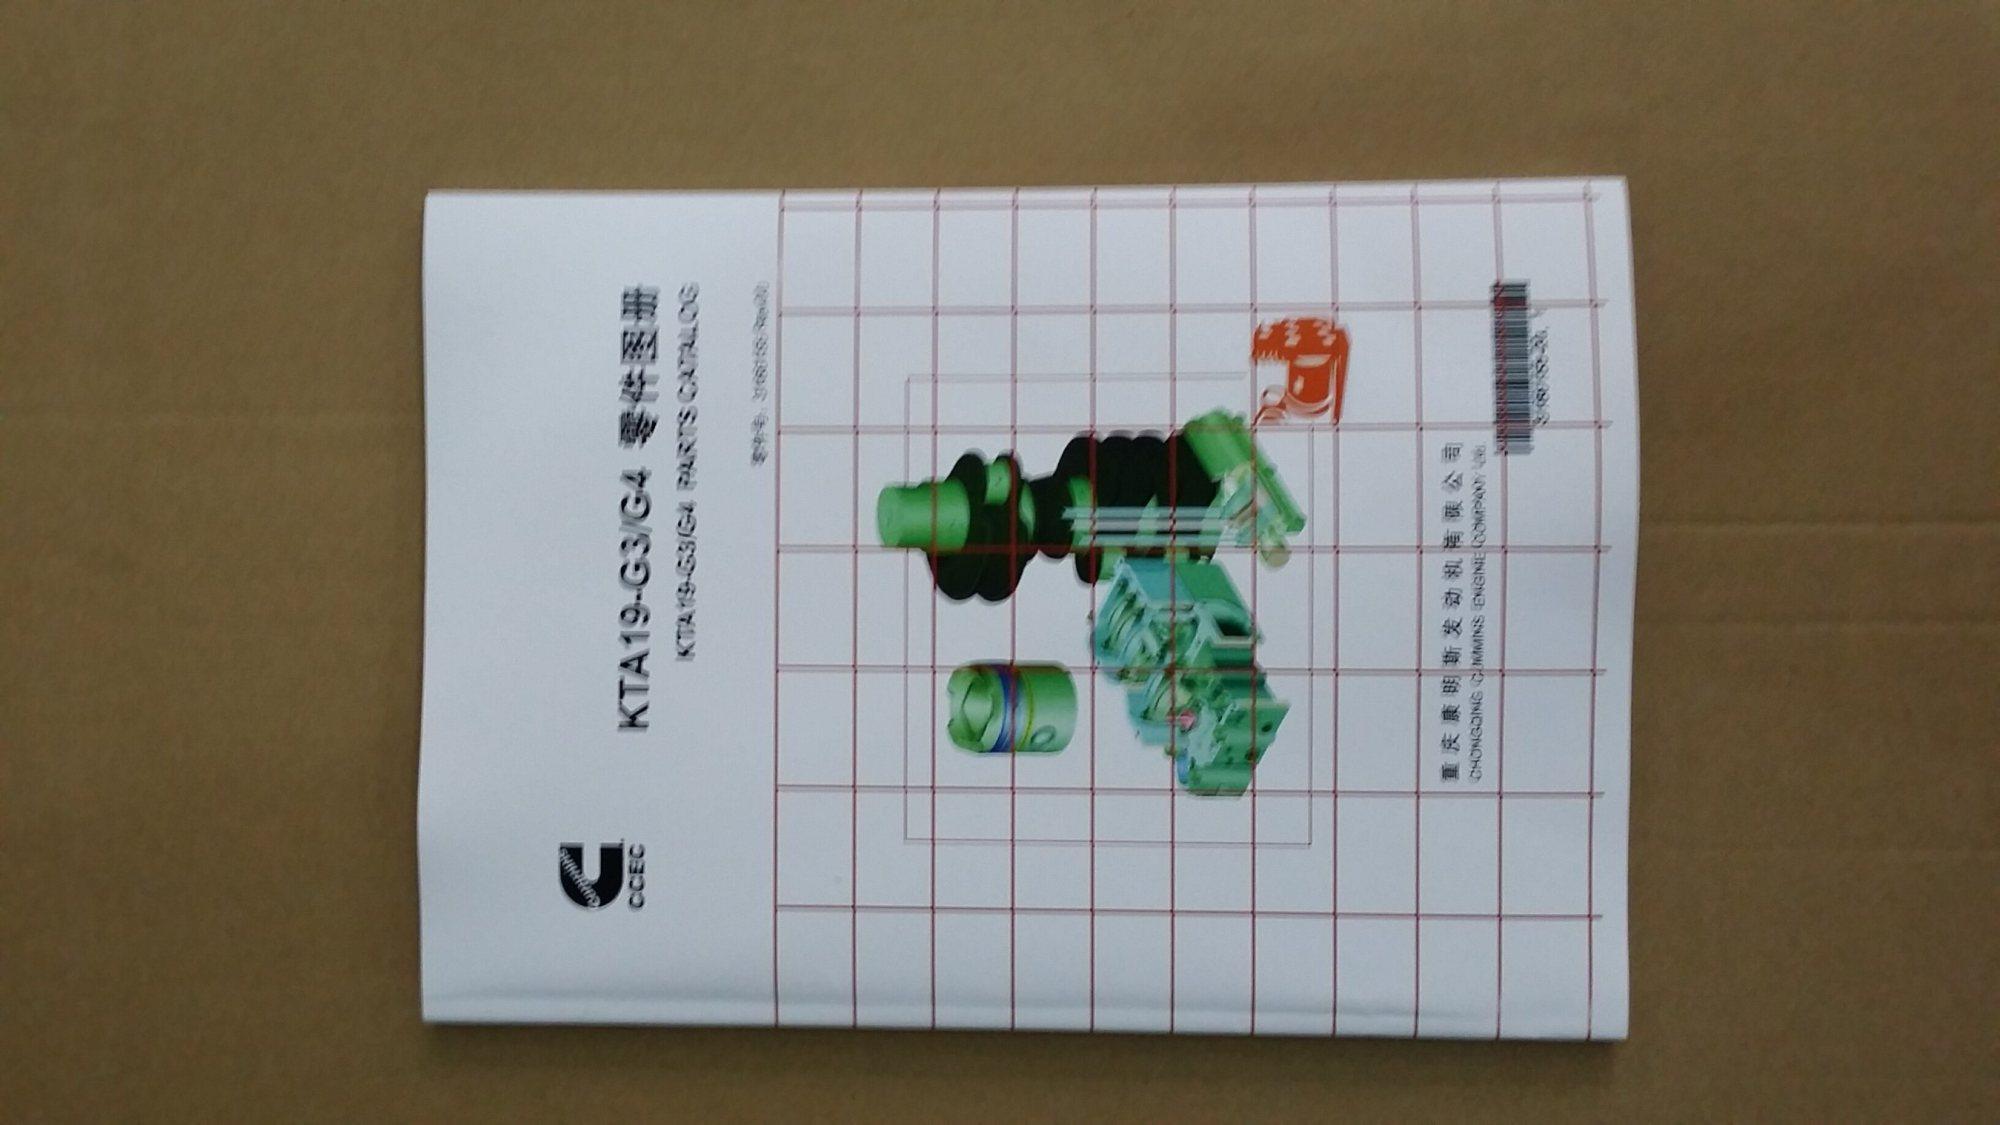 hight resolution of  array china diesel engine spart part kta 19 g3 parts catalogue china rh cumwan en